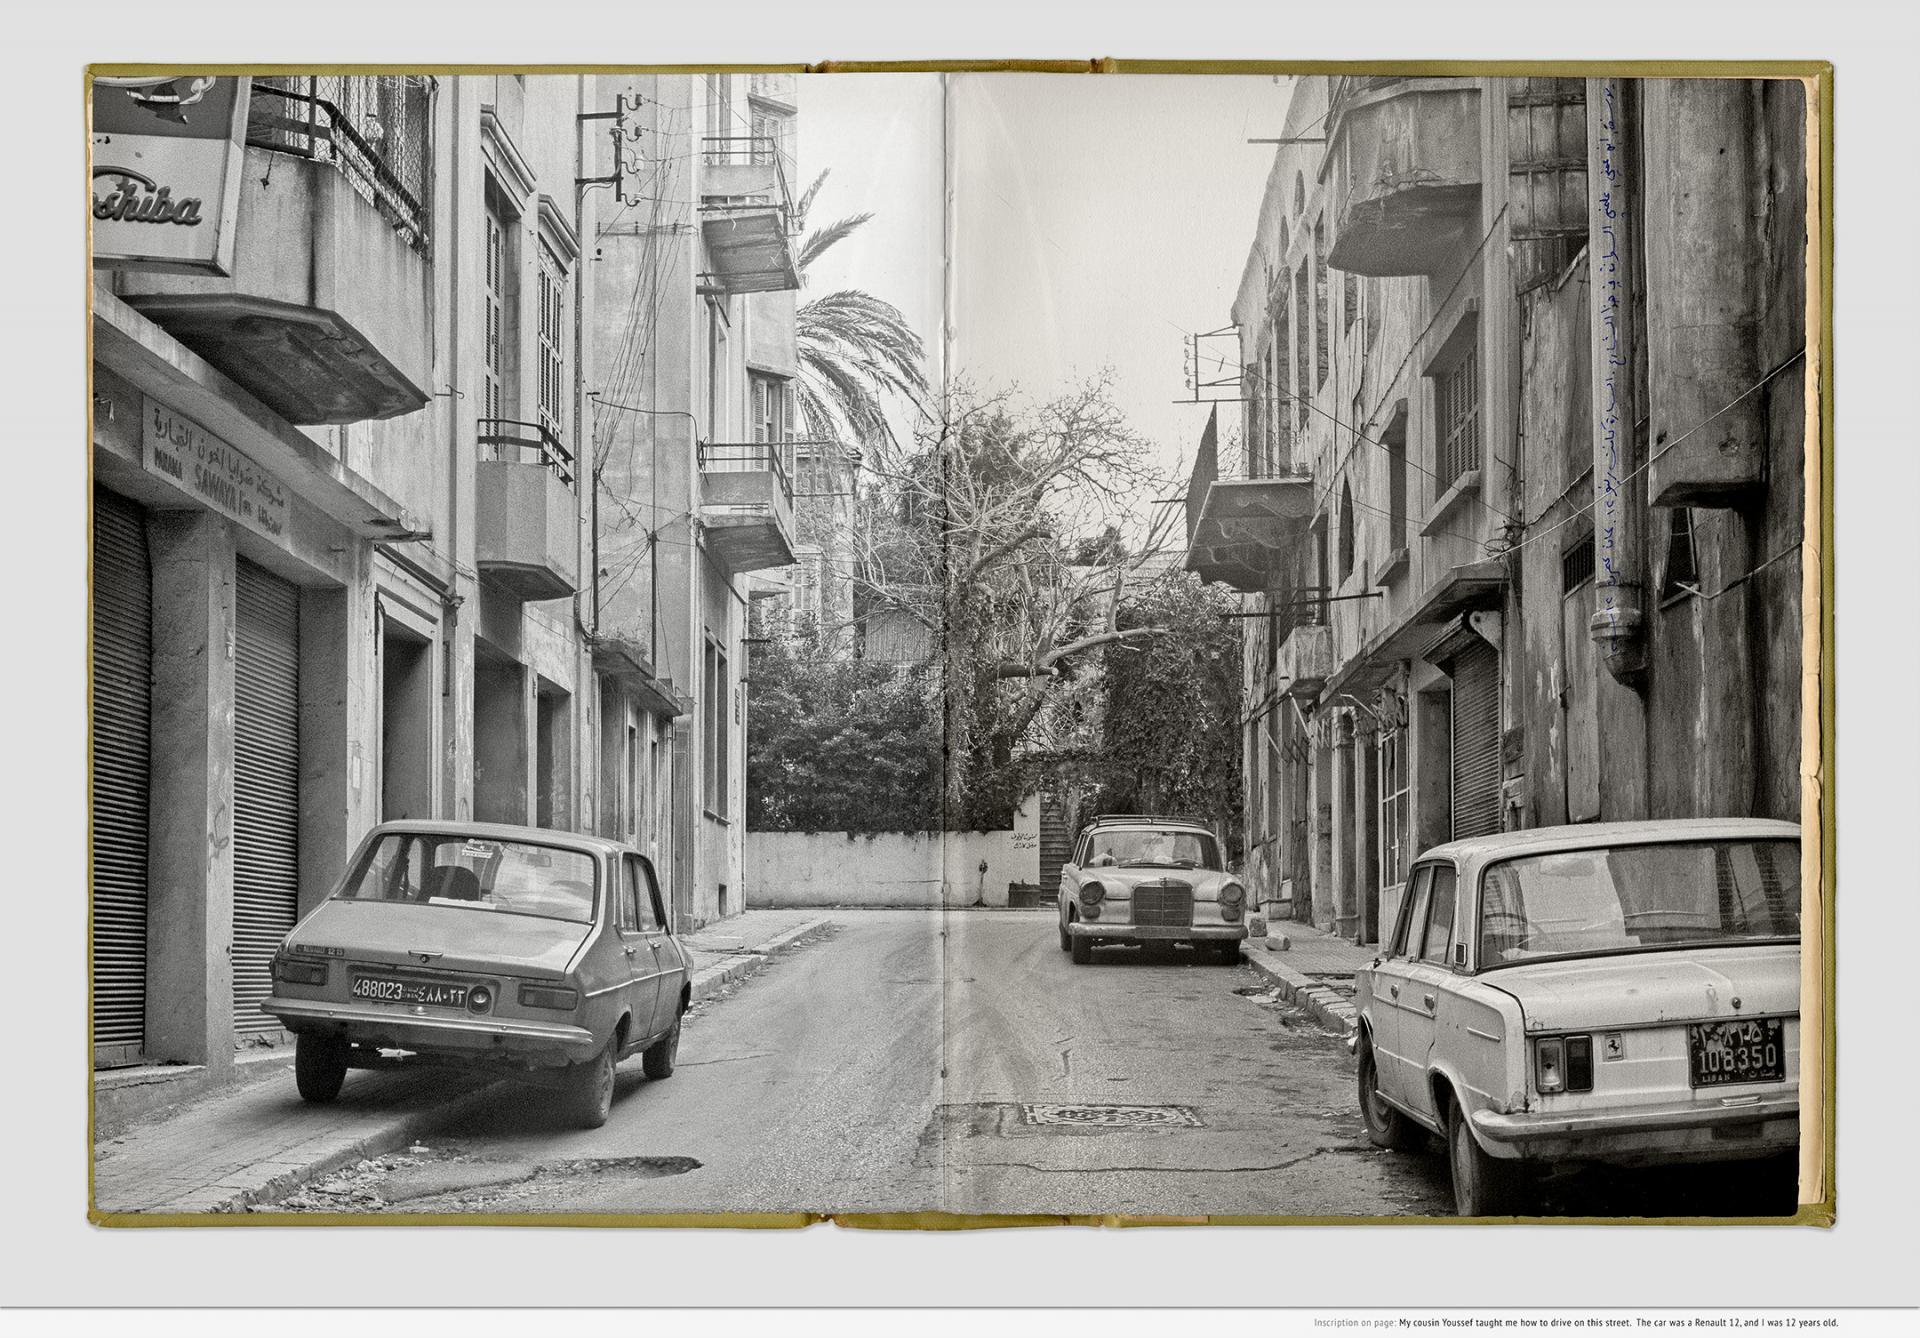 Sweet Talk. Commissions (Beirut) _ 1987.004, 1987-2019, inkjet print, 54.3 x 76.3 x 3.5cm, framed